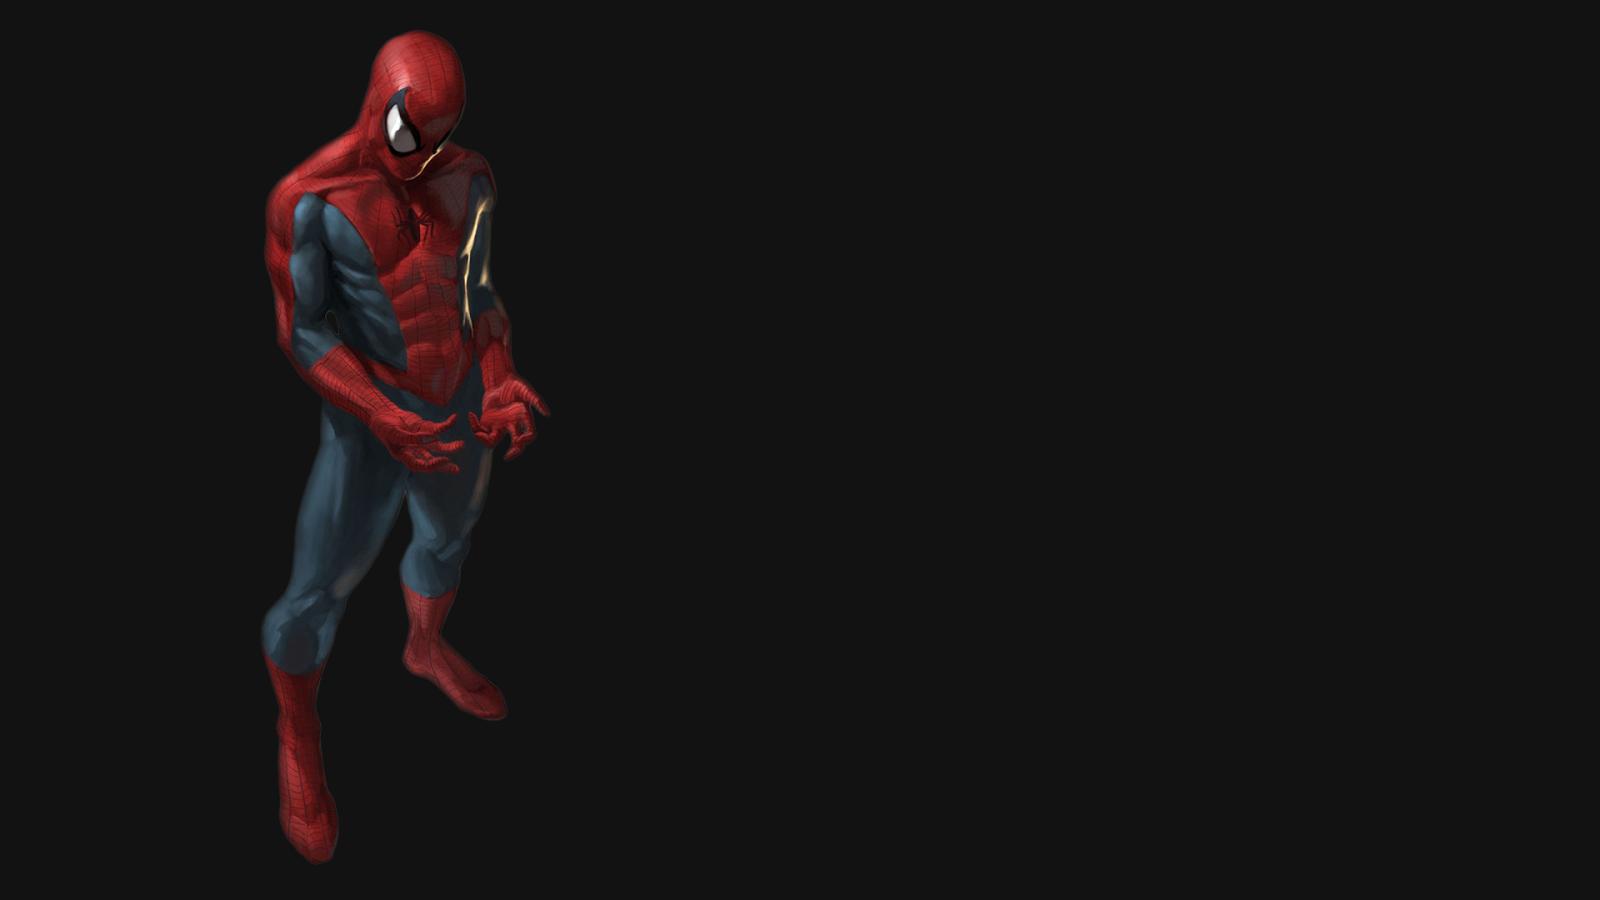 Black Spiderman Wallpaper Download HD